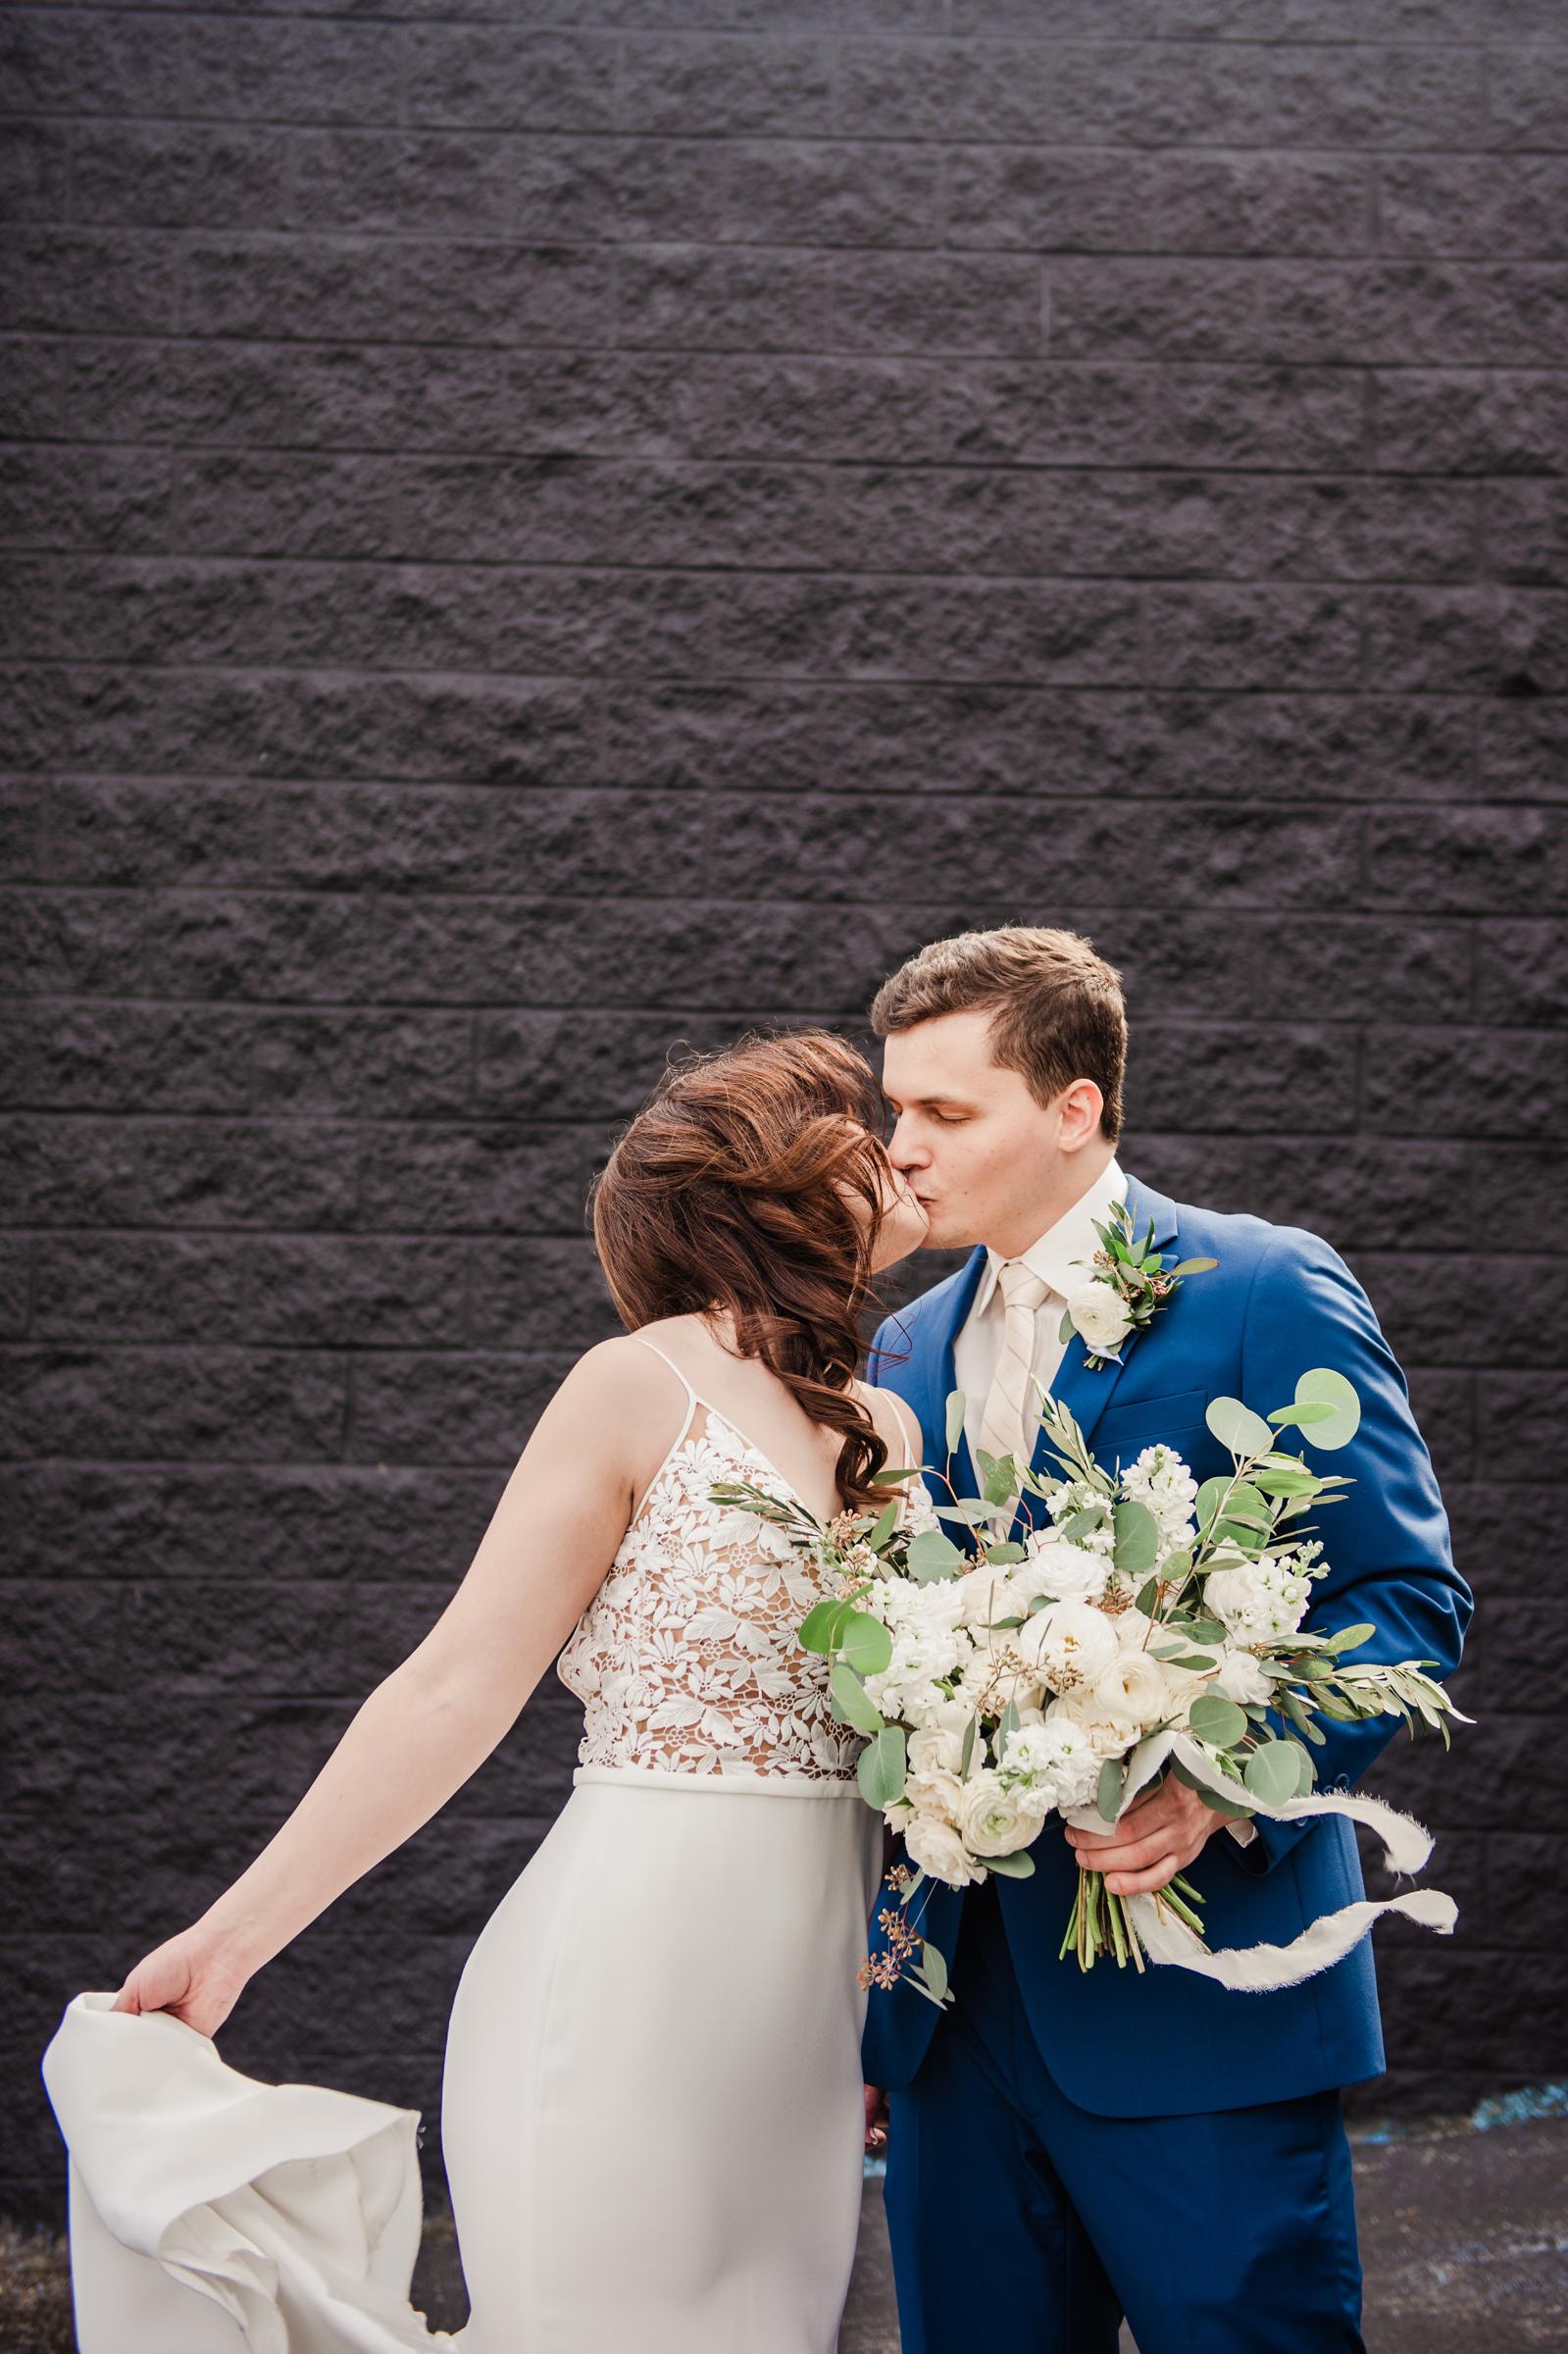 The_Arbor_LoftRochester_Wedding_JILL_STUDIO_Rochester_NY_Photographer_160449.jpg